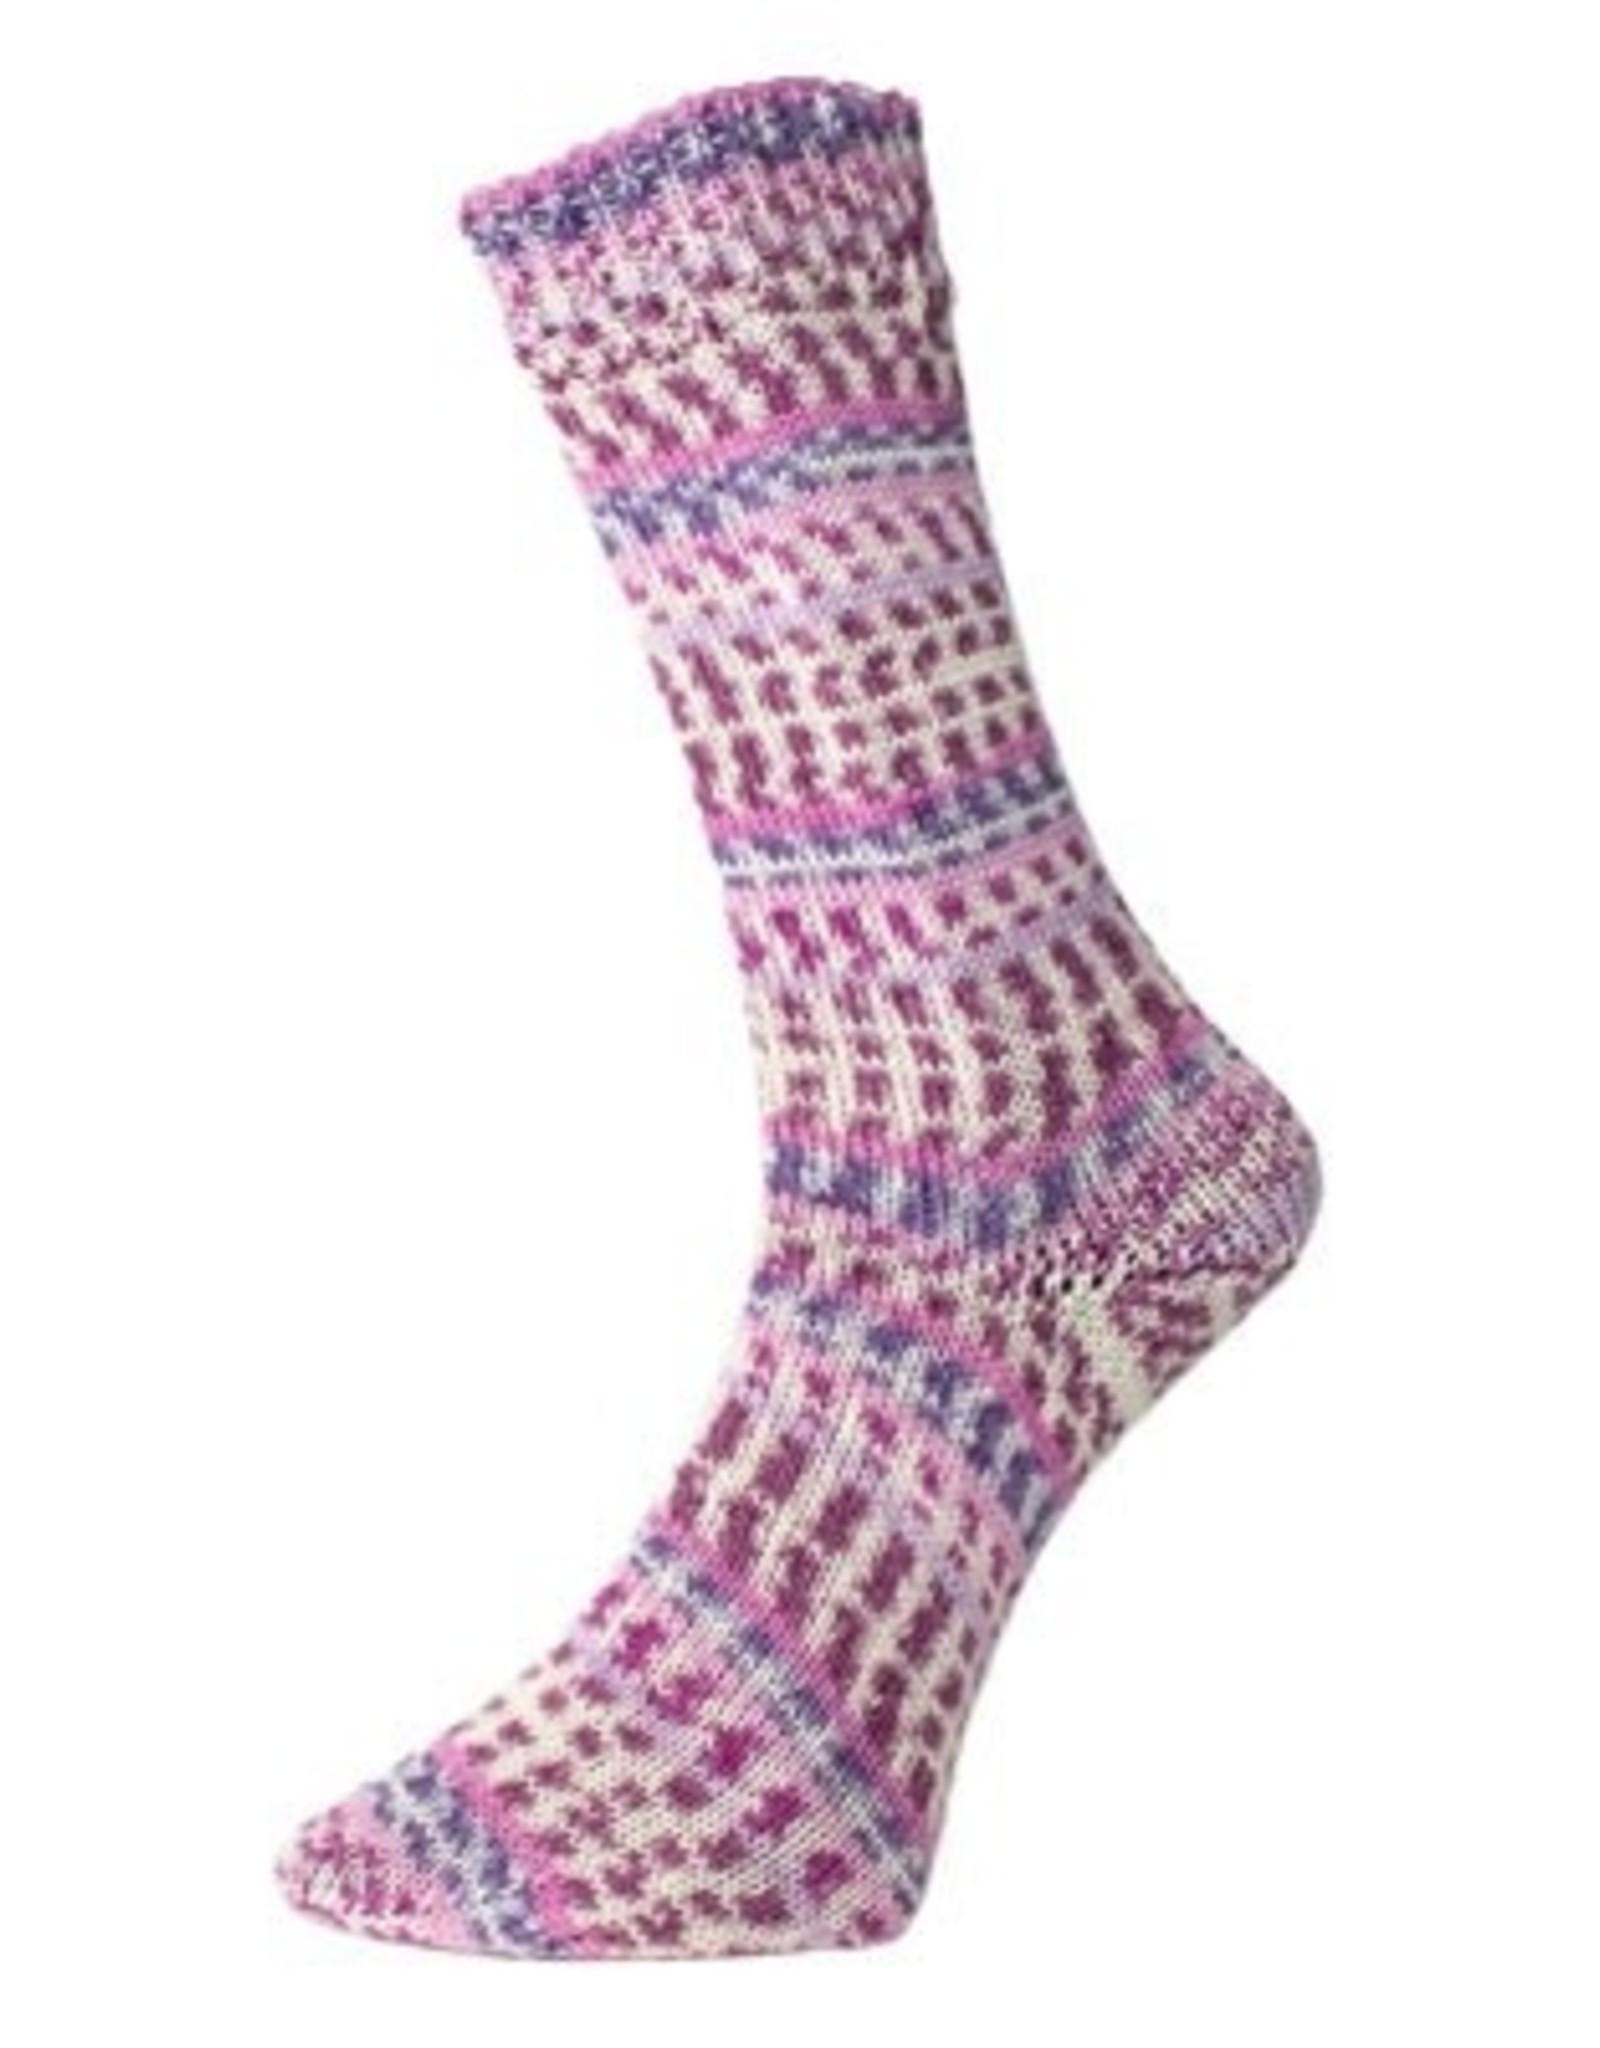 Pro Lana Pro Lana - Golden sock 1 de 2